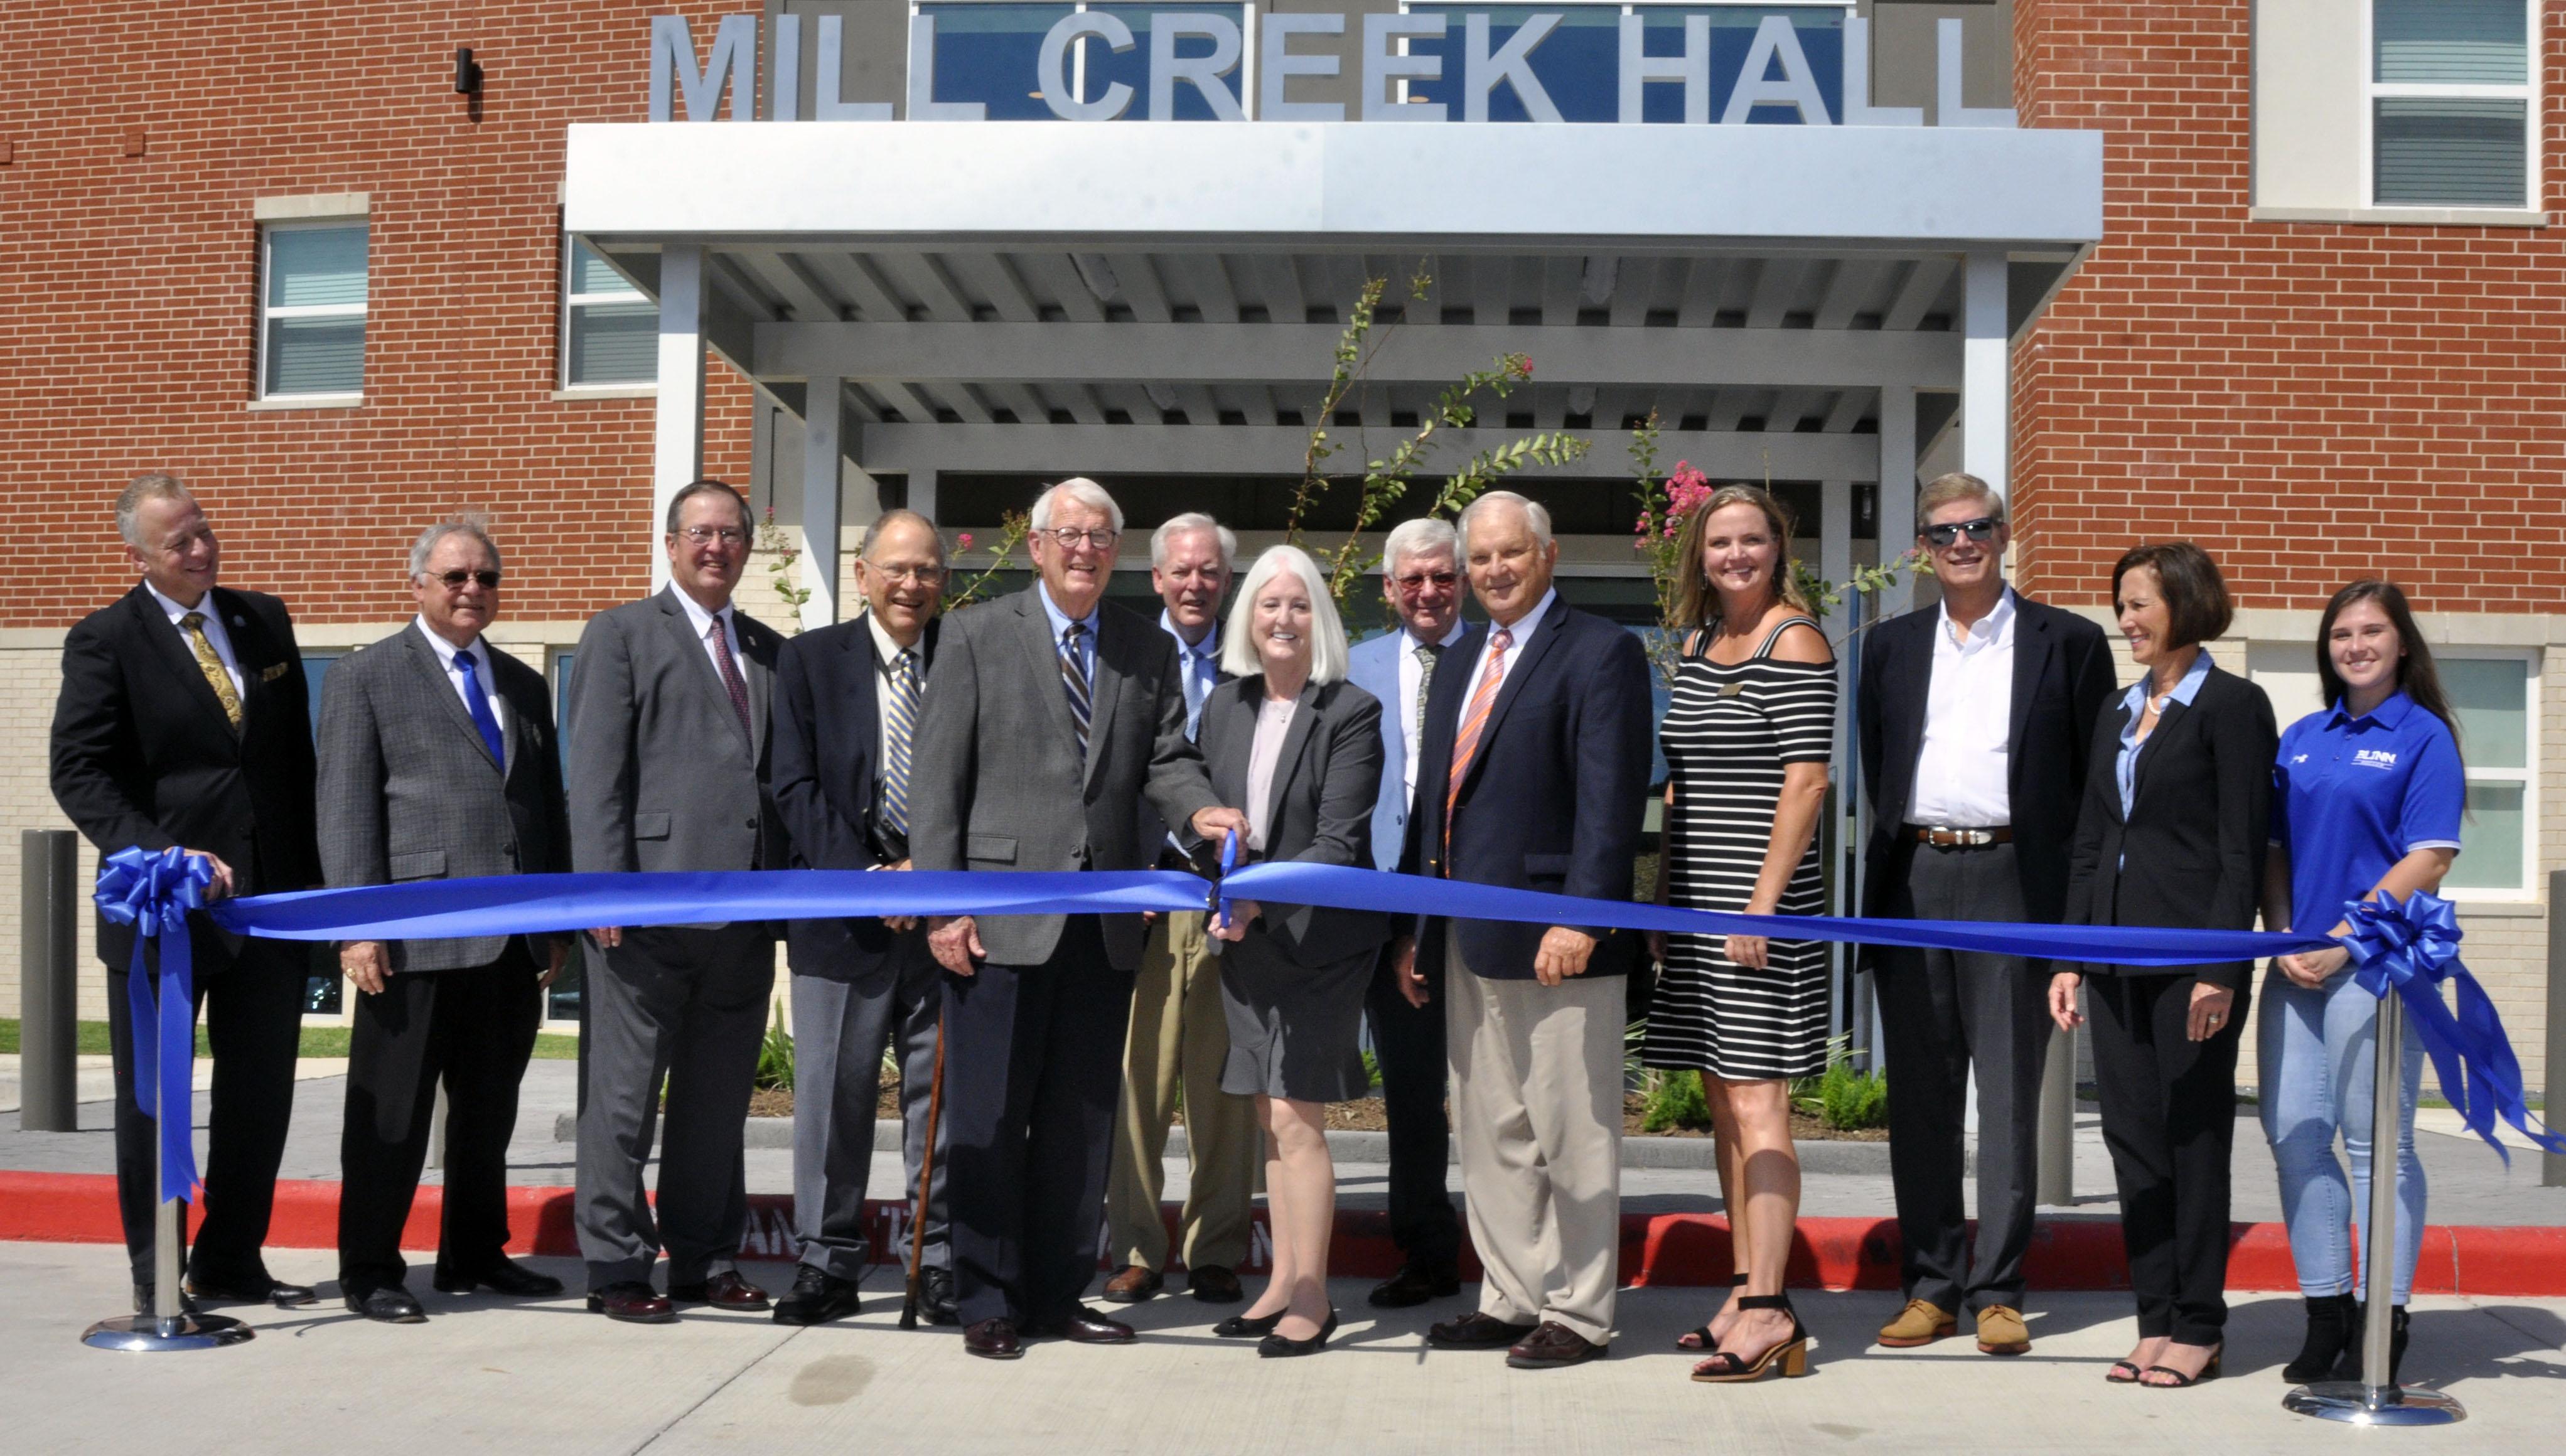 Mill Creek Hall Grand Opening.jpg